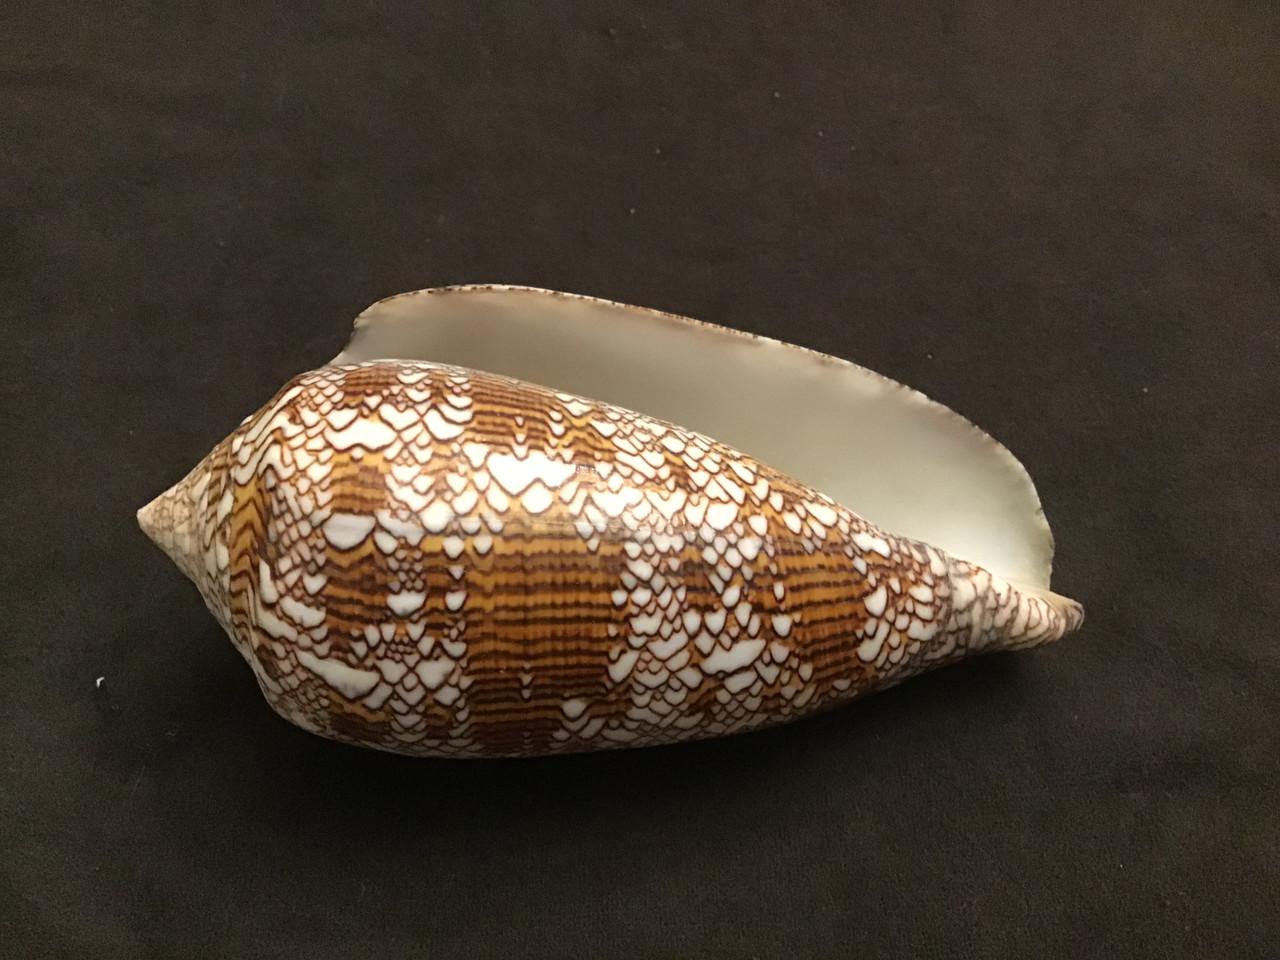 Conus Textile Giant